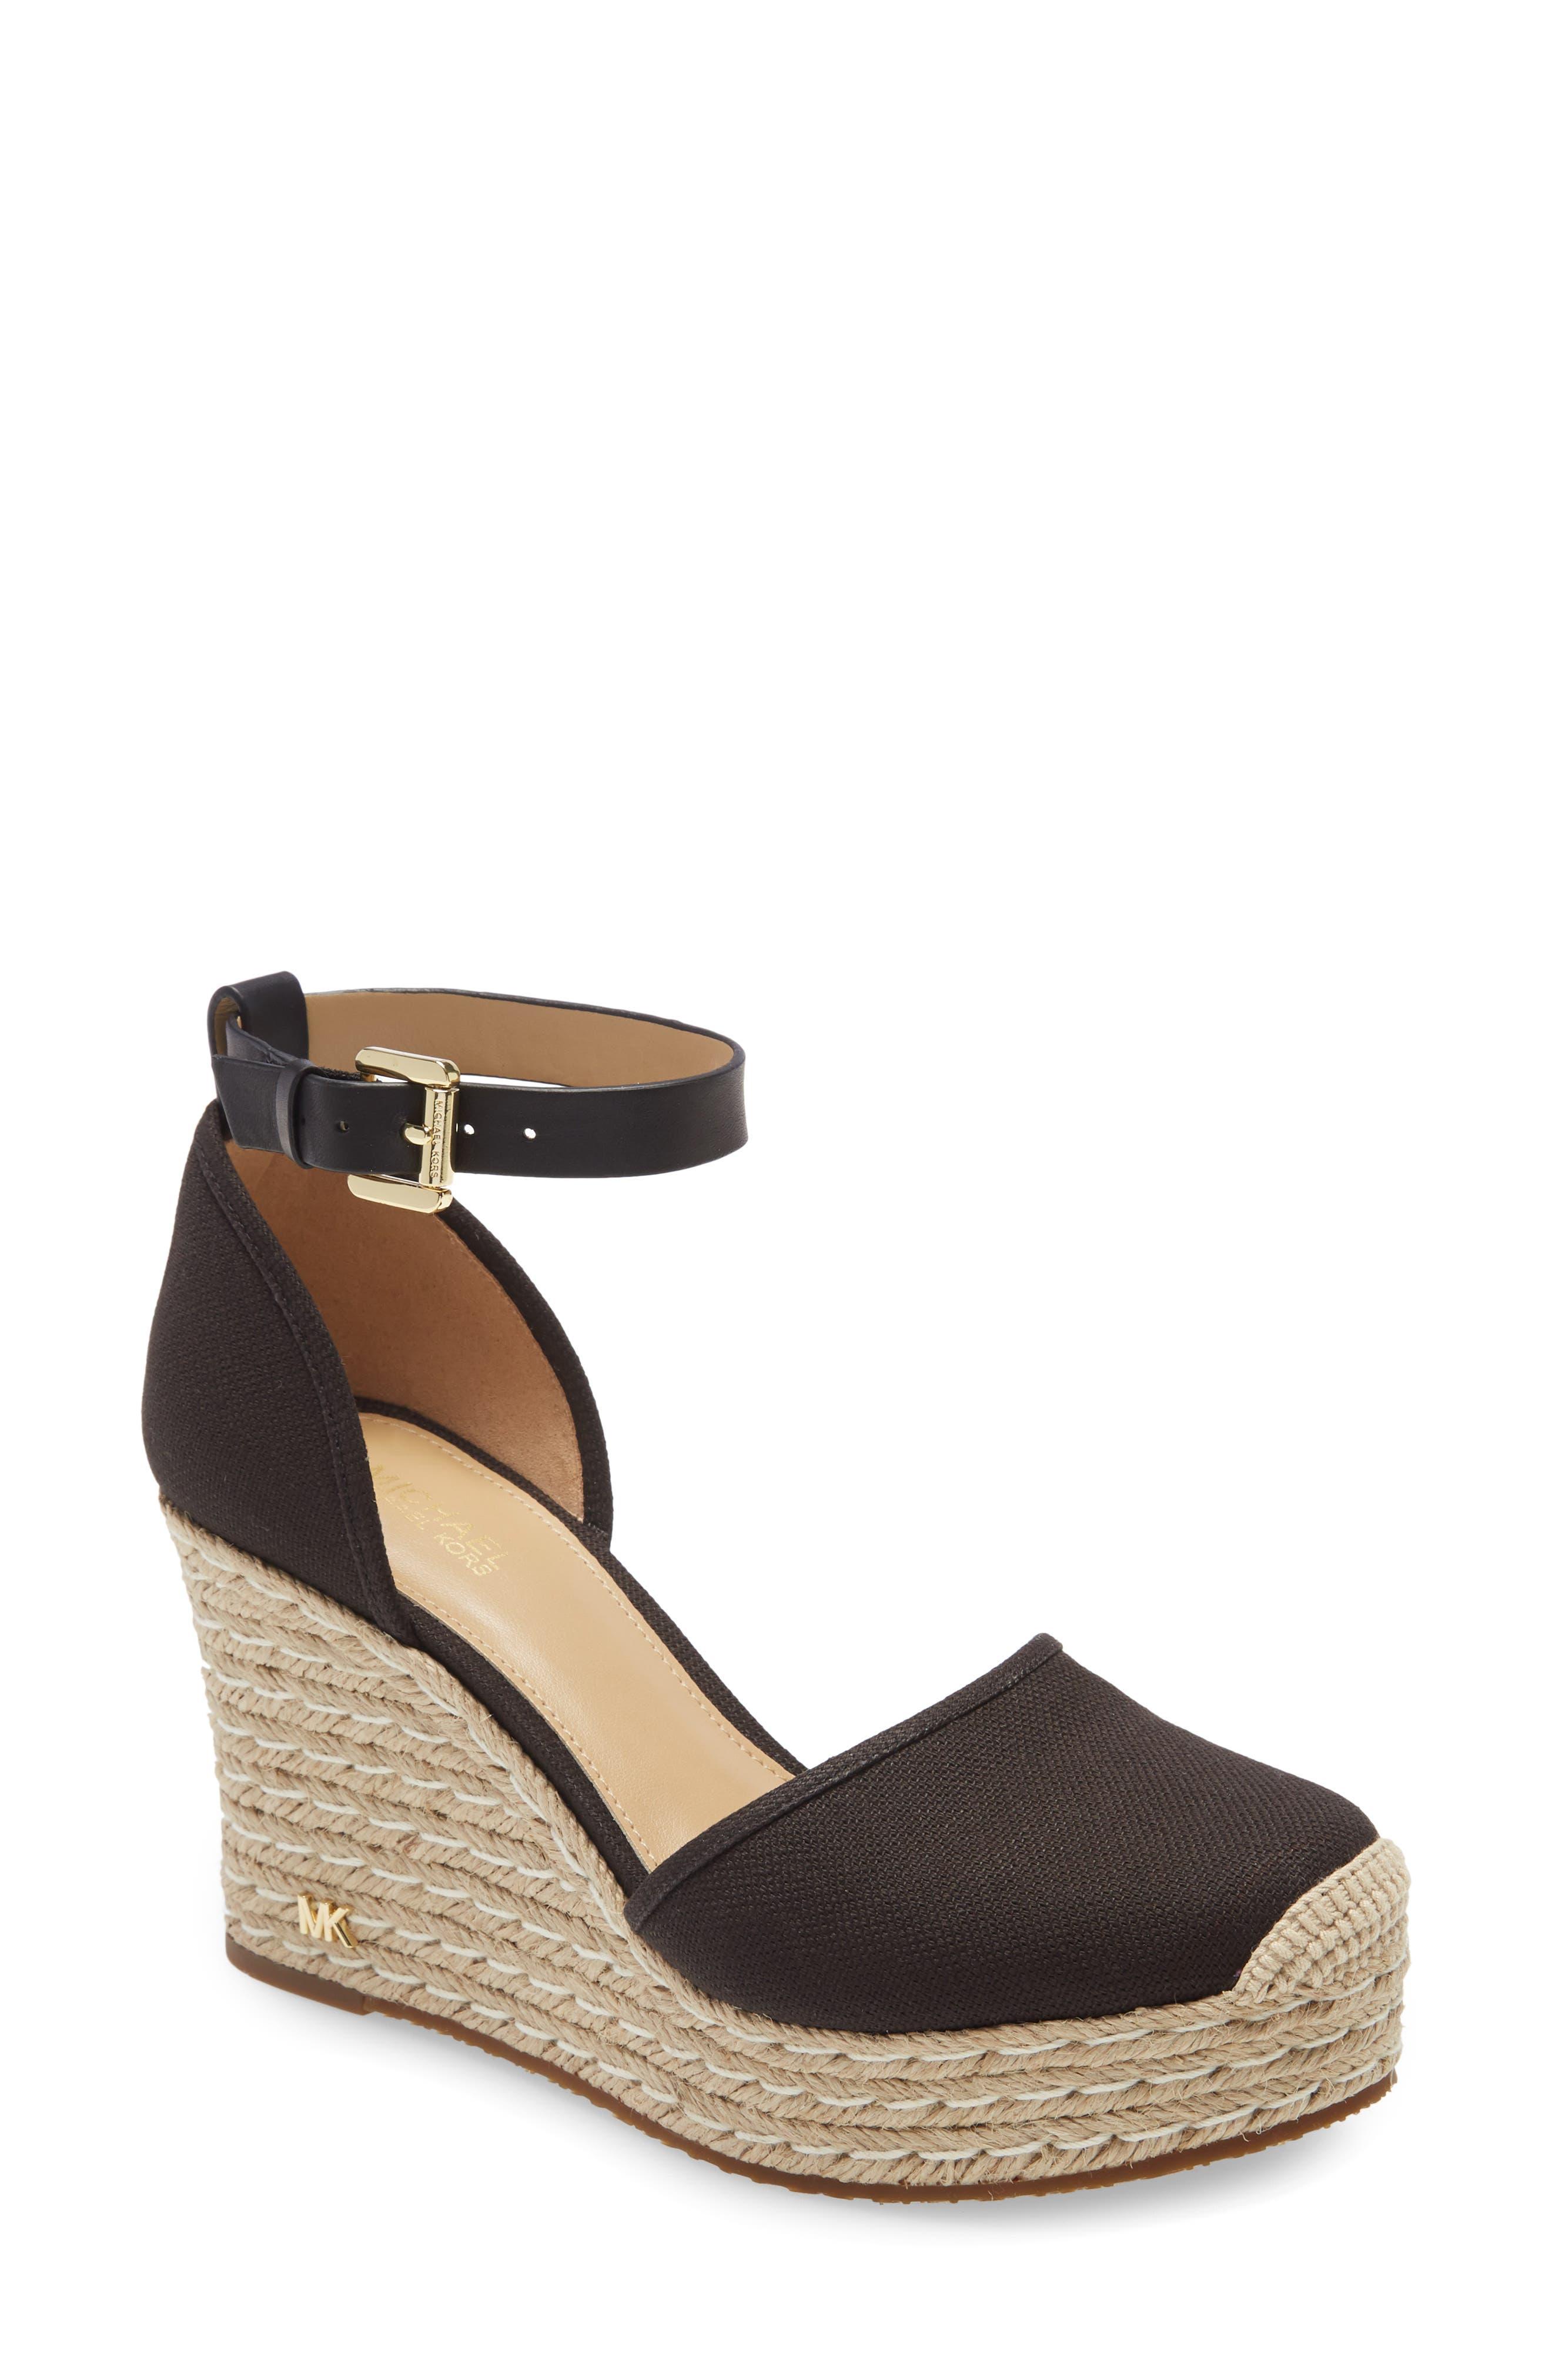 Womens Flip Flops Platform Wedges Sandals Ladies Summer Beach Mules Shoes Size